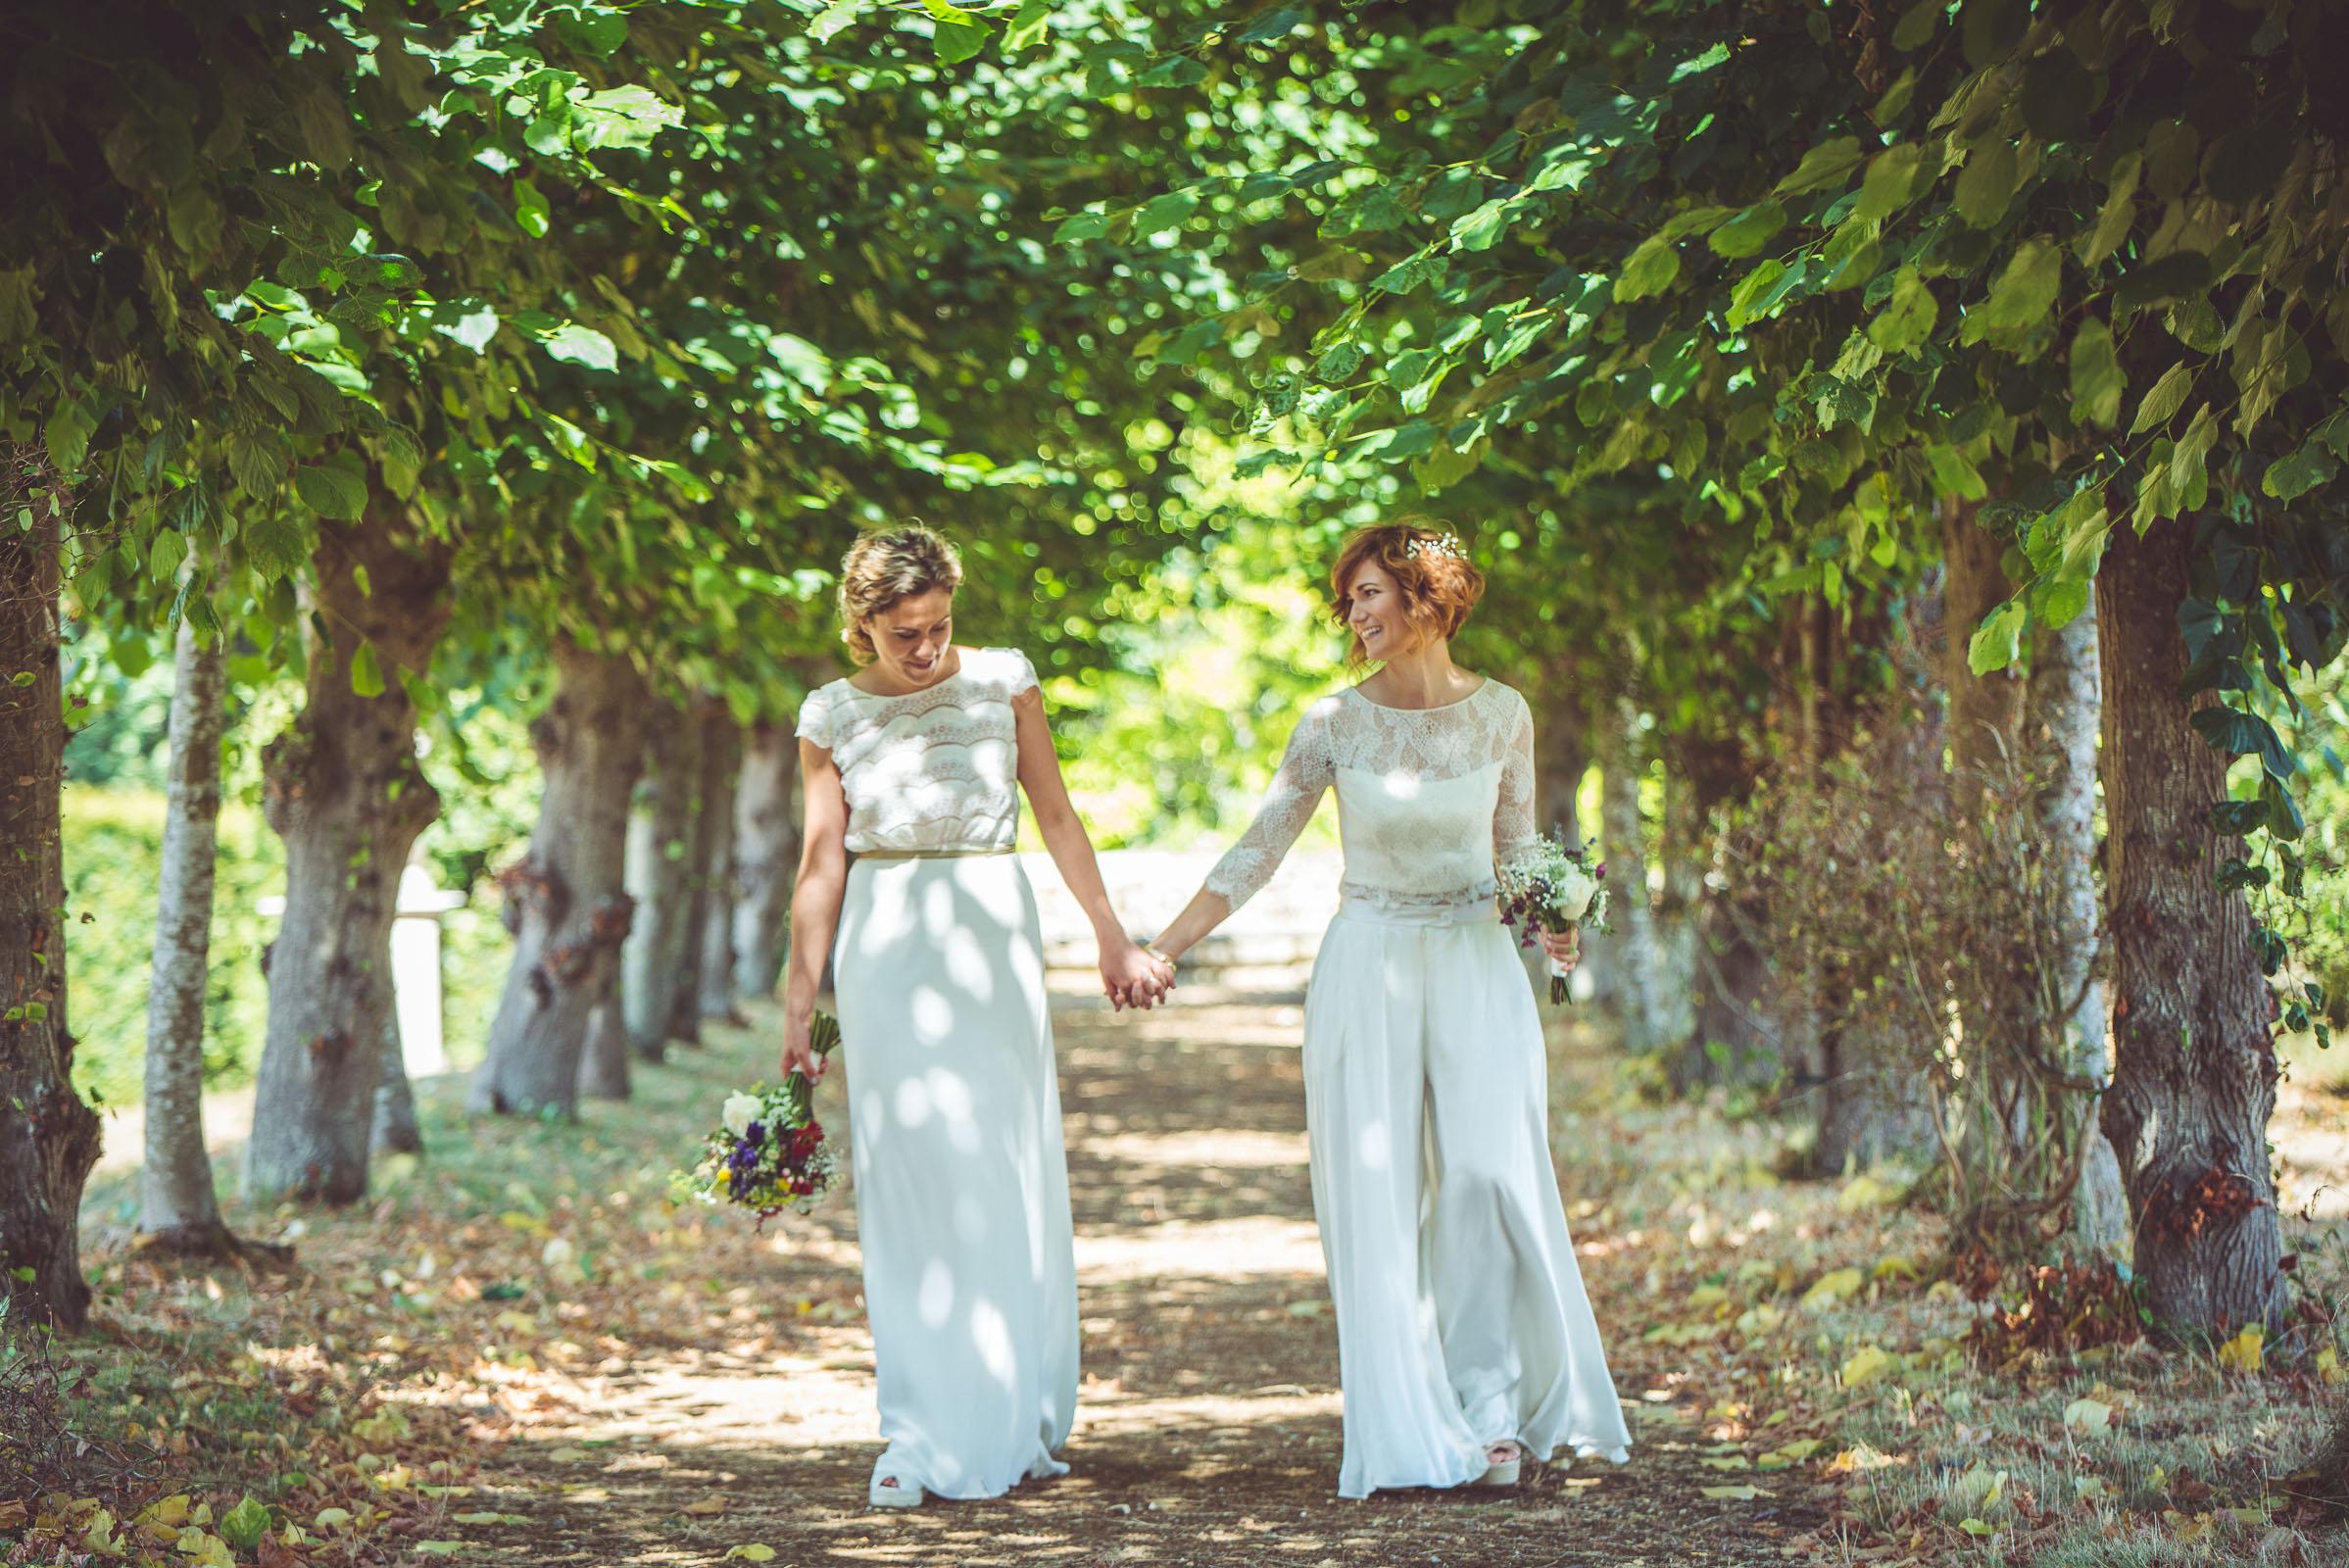 Hitchin_wedding_St_Pauls_Waldenbury_Royston_Wedding_Photographer-29.jpg